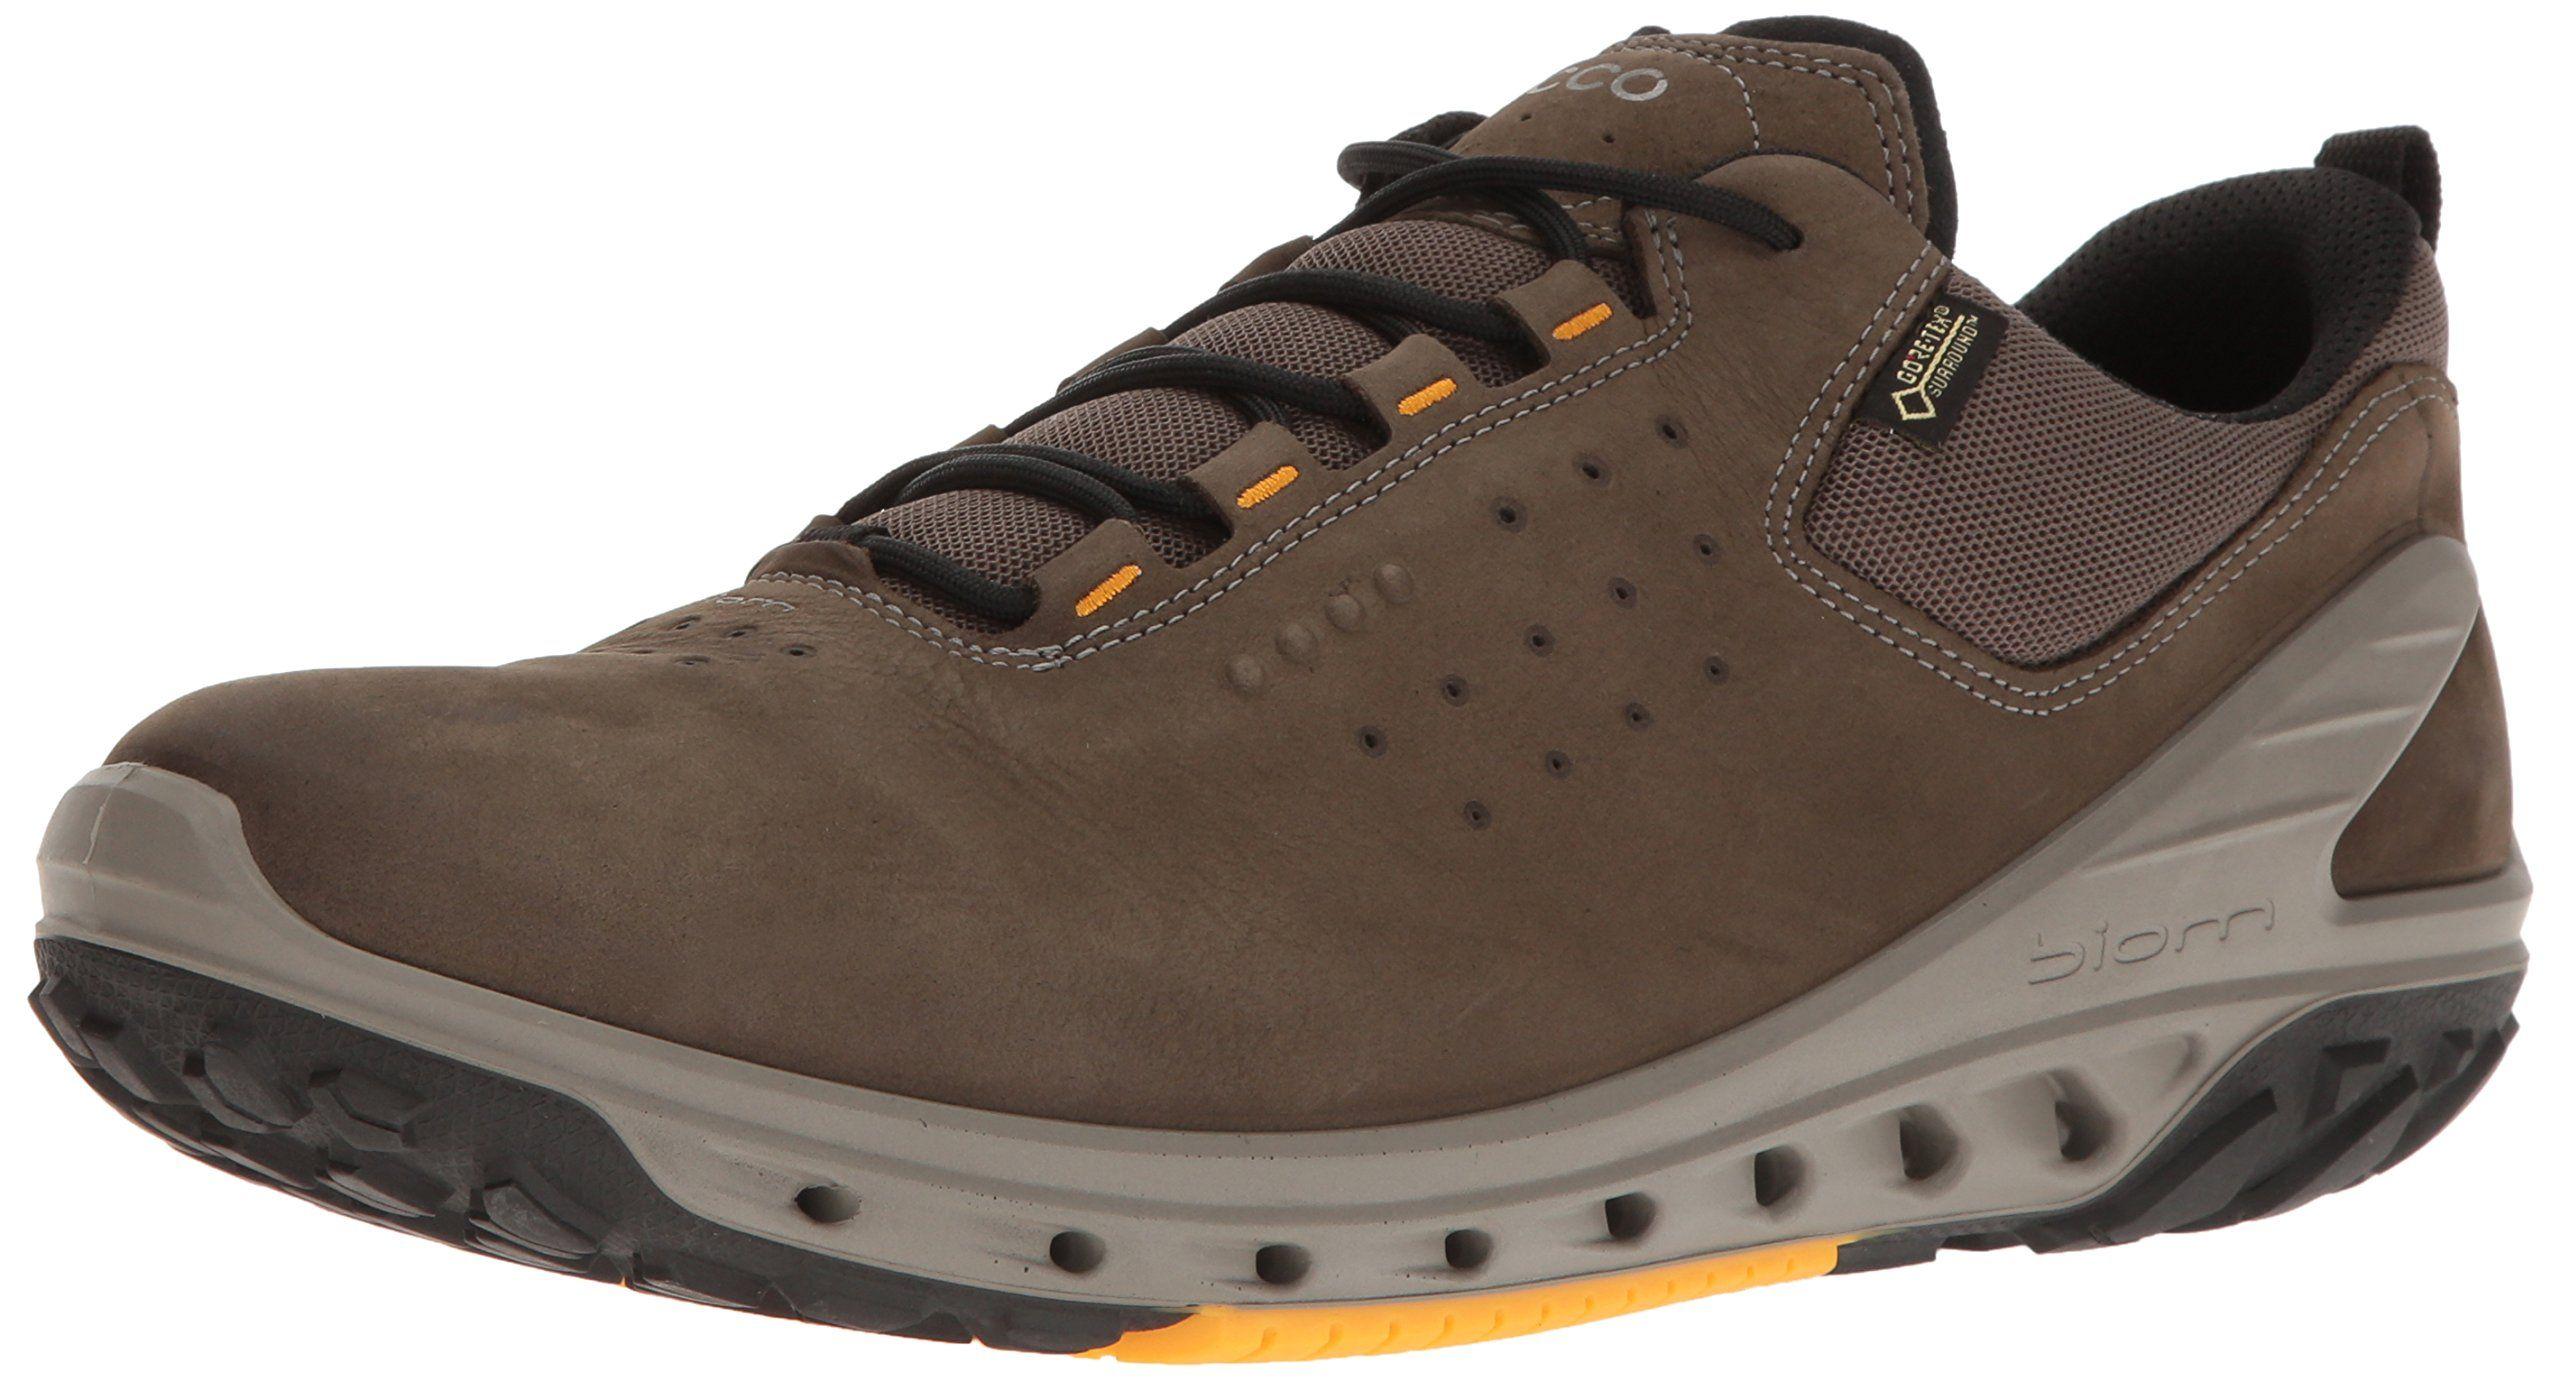 ECCO Men's Biom Venture Gore Tex Tie Hiking Shoe, Tarmac